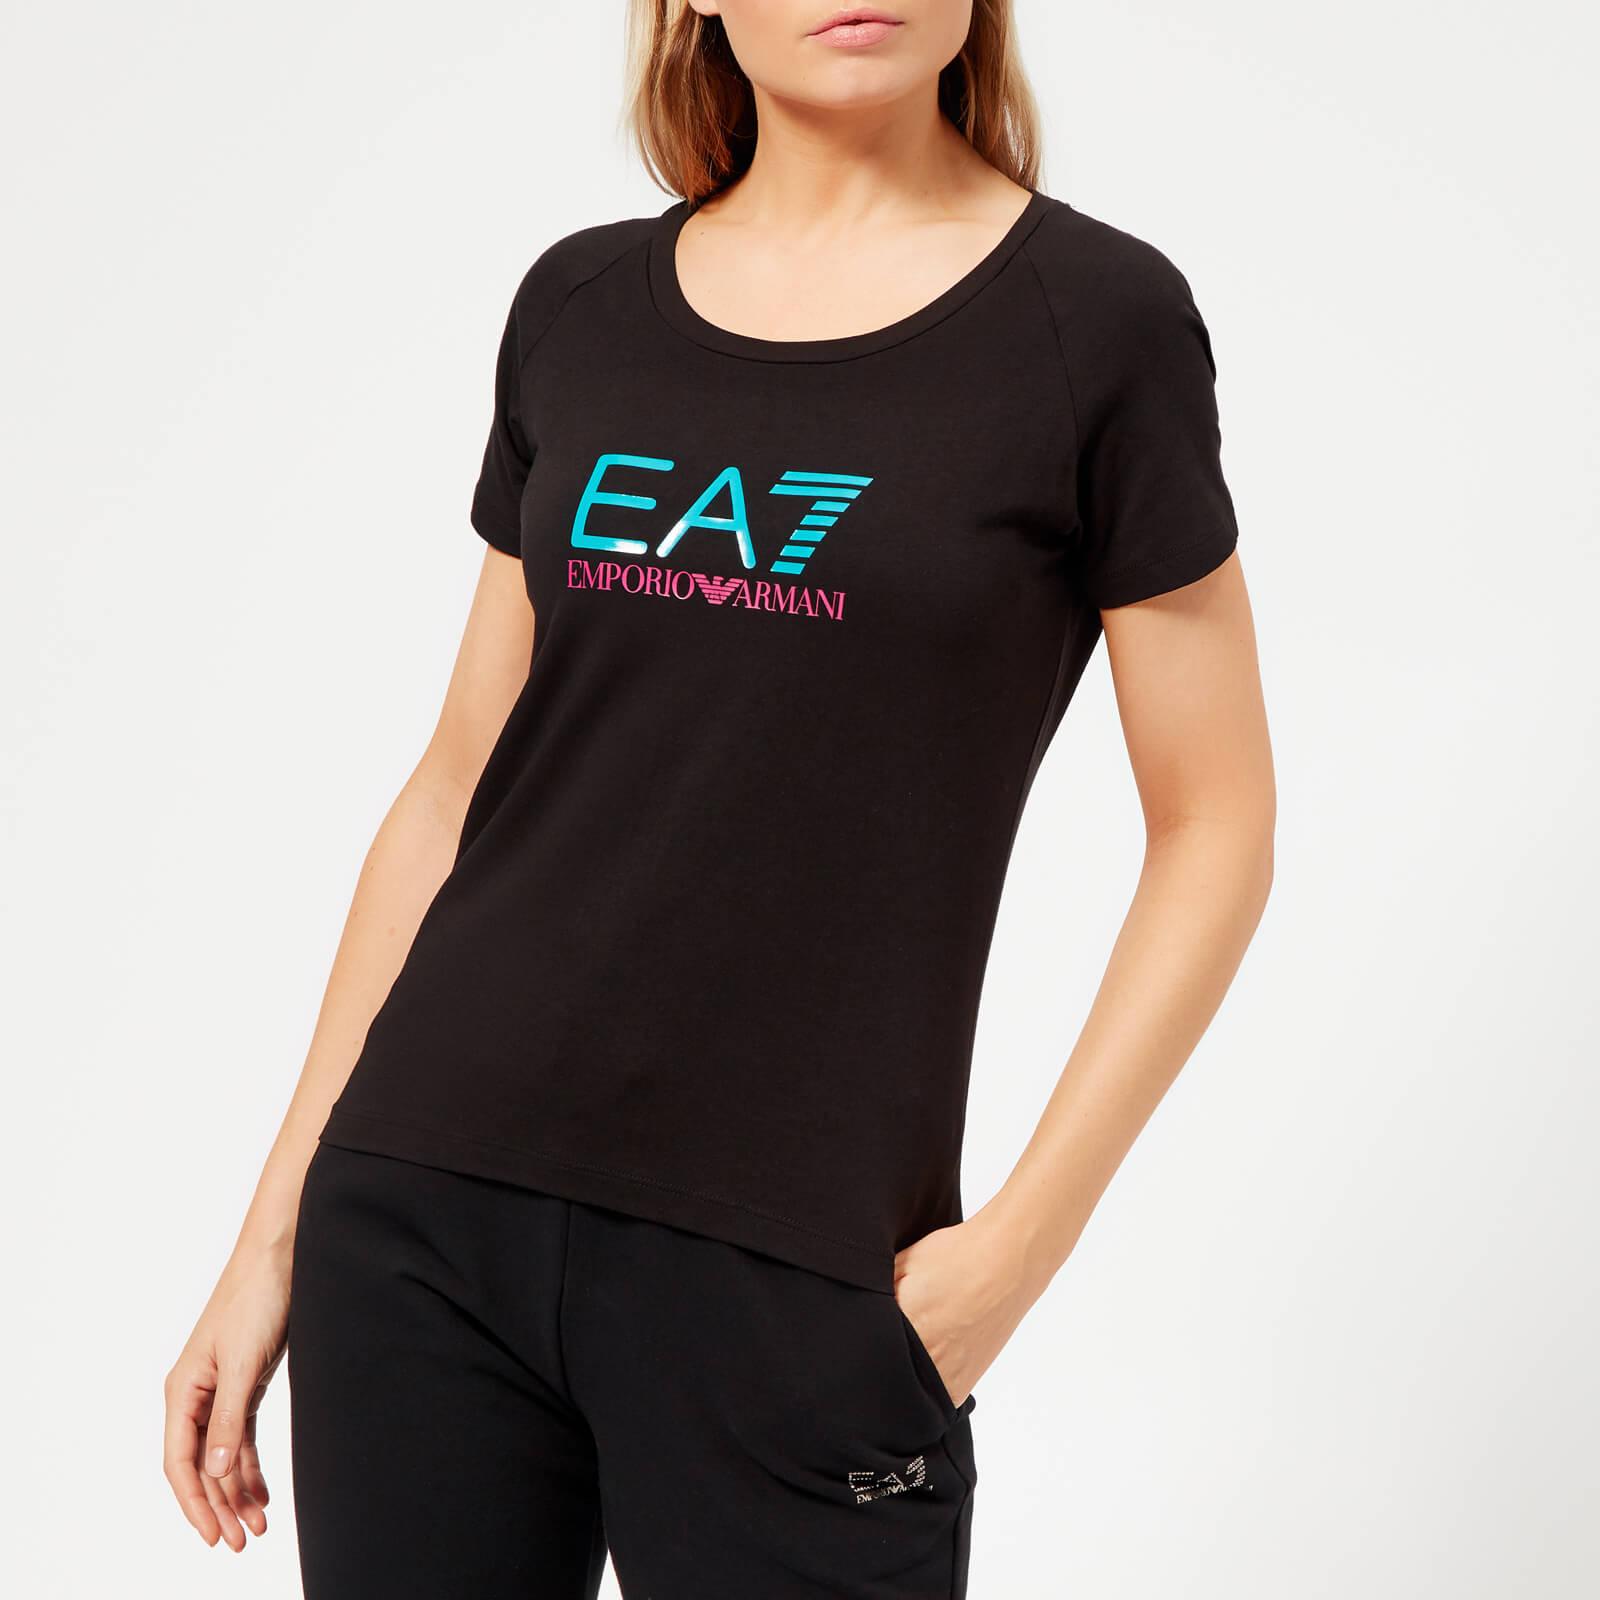 0a85a6906 Emporio Armani EA7 Women's Train Logo Series Shiny Print T-Shirt - Black  Sports & Leisure | TheHut.com